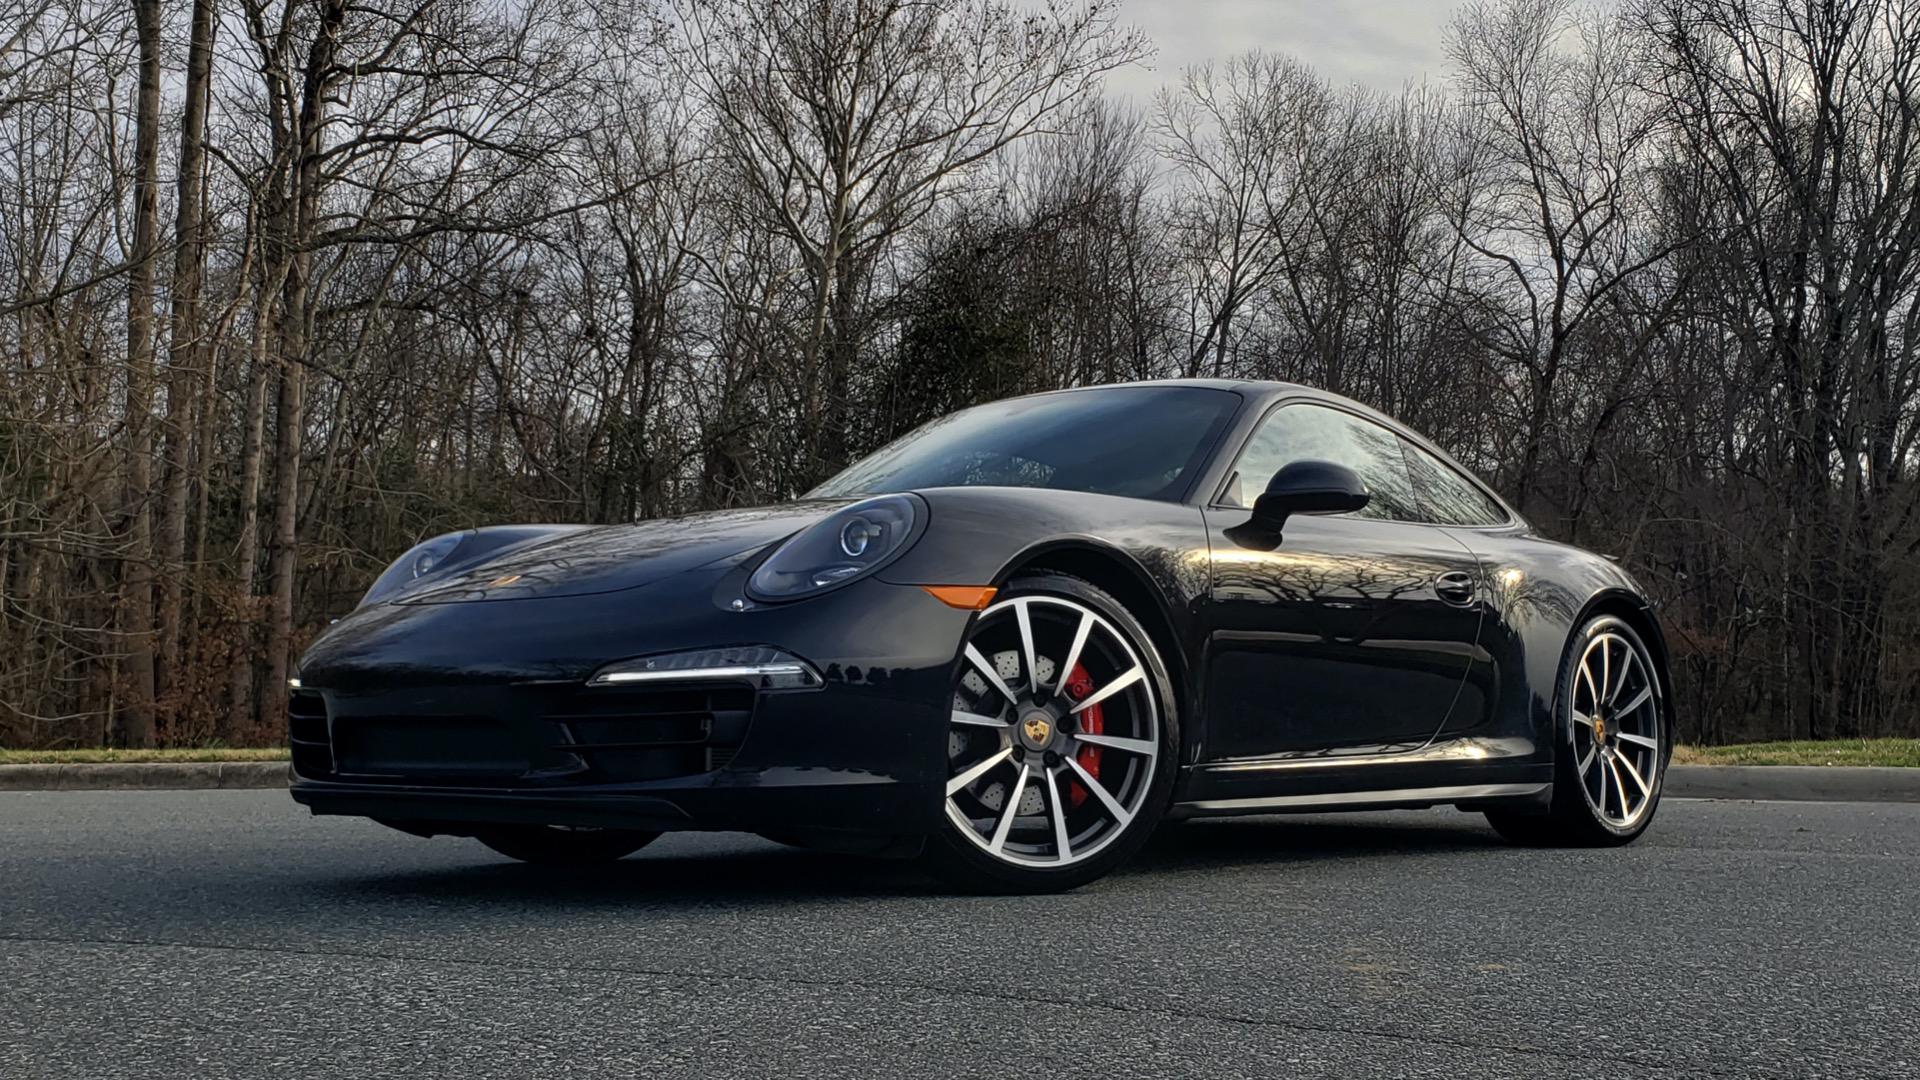 Used 2014 Porsche 911 CARRERA 4S / PREM PKG PLUS / NAV / SUNROO / BOSE / CHRONO for sale Sold at Formula Imports in Charlotte NC 28227 2